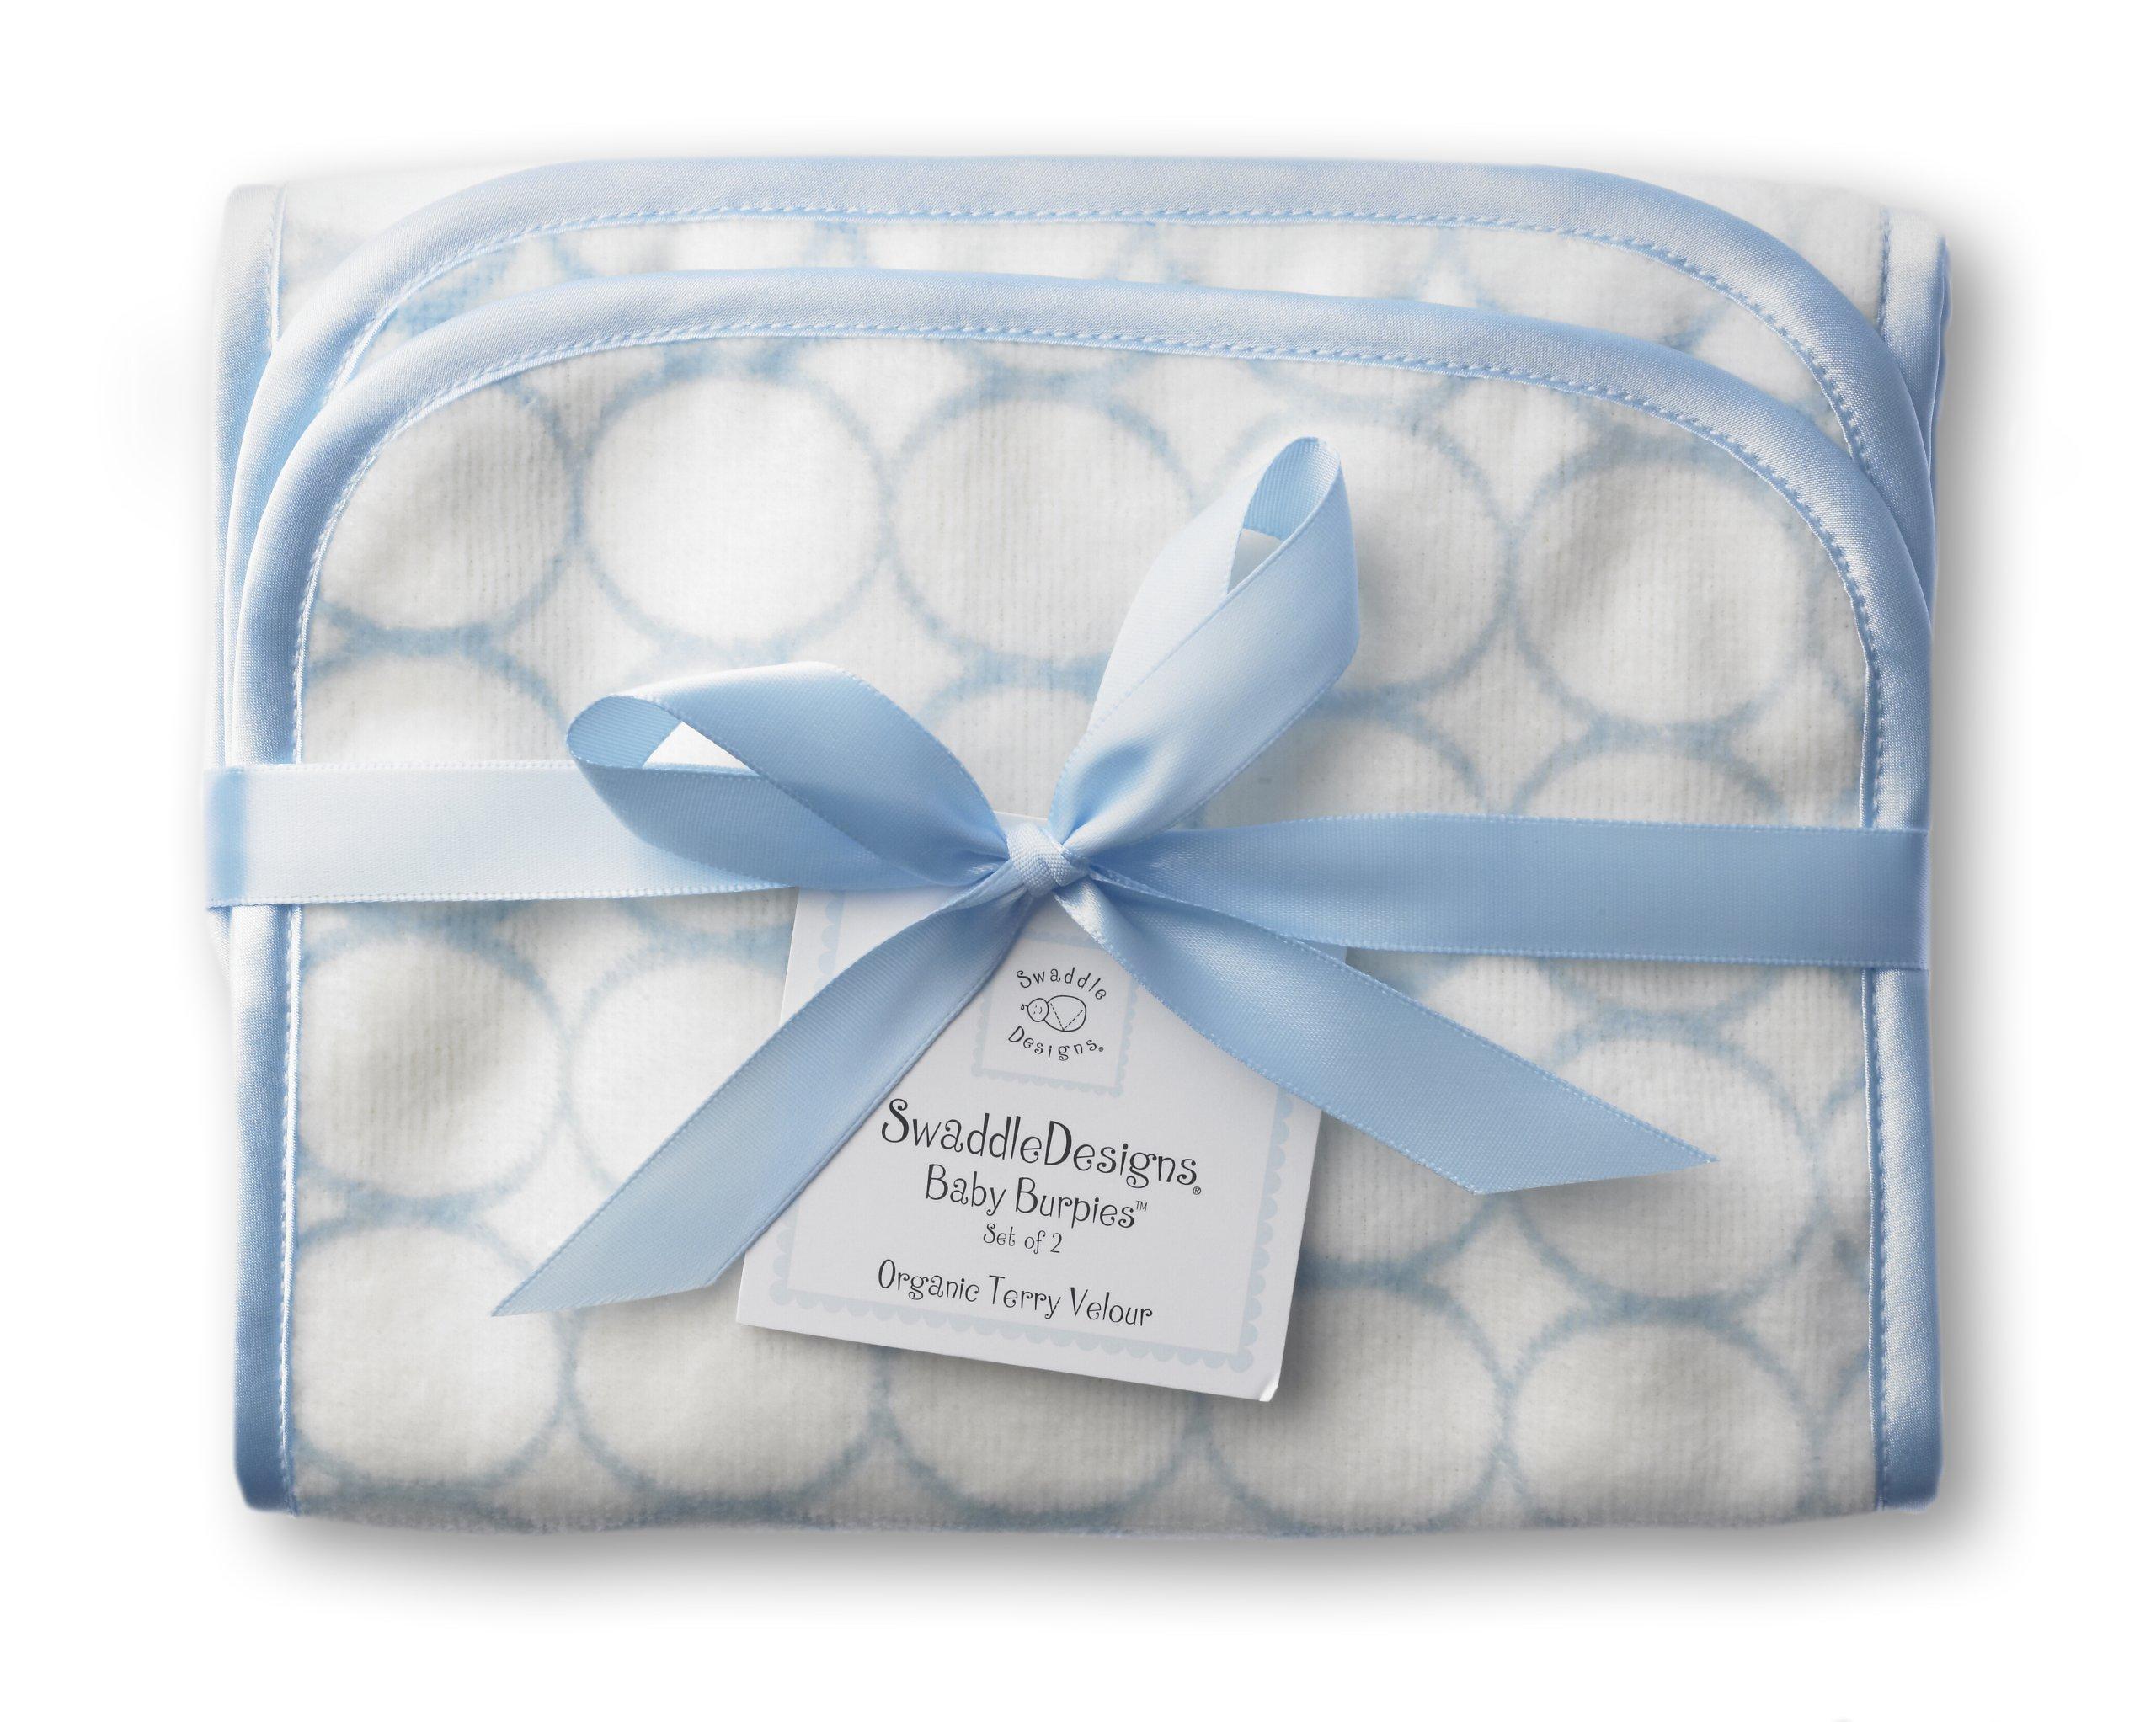 SwaddleDesigns Organic Cotton Terry Velour Baby Burpies, Set of 2 Cotton Burp Cloths, Pastel Blue Mod Circles